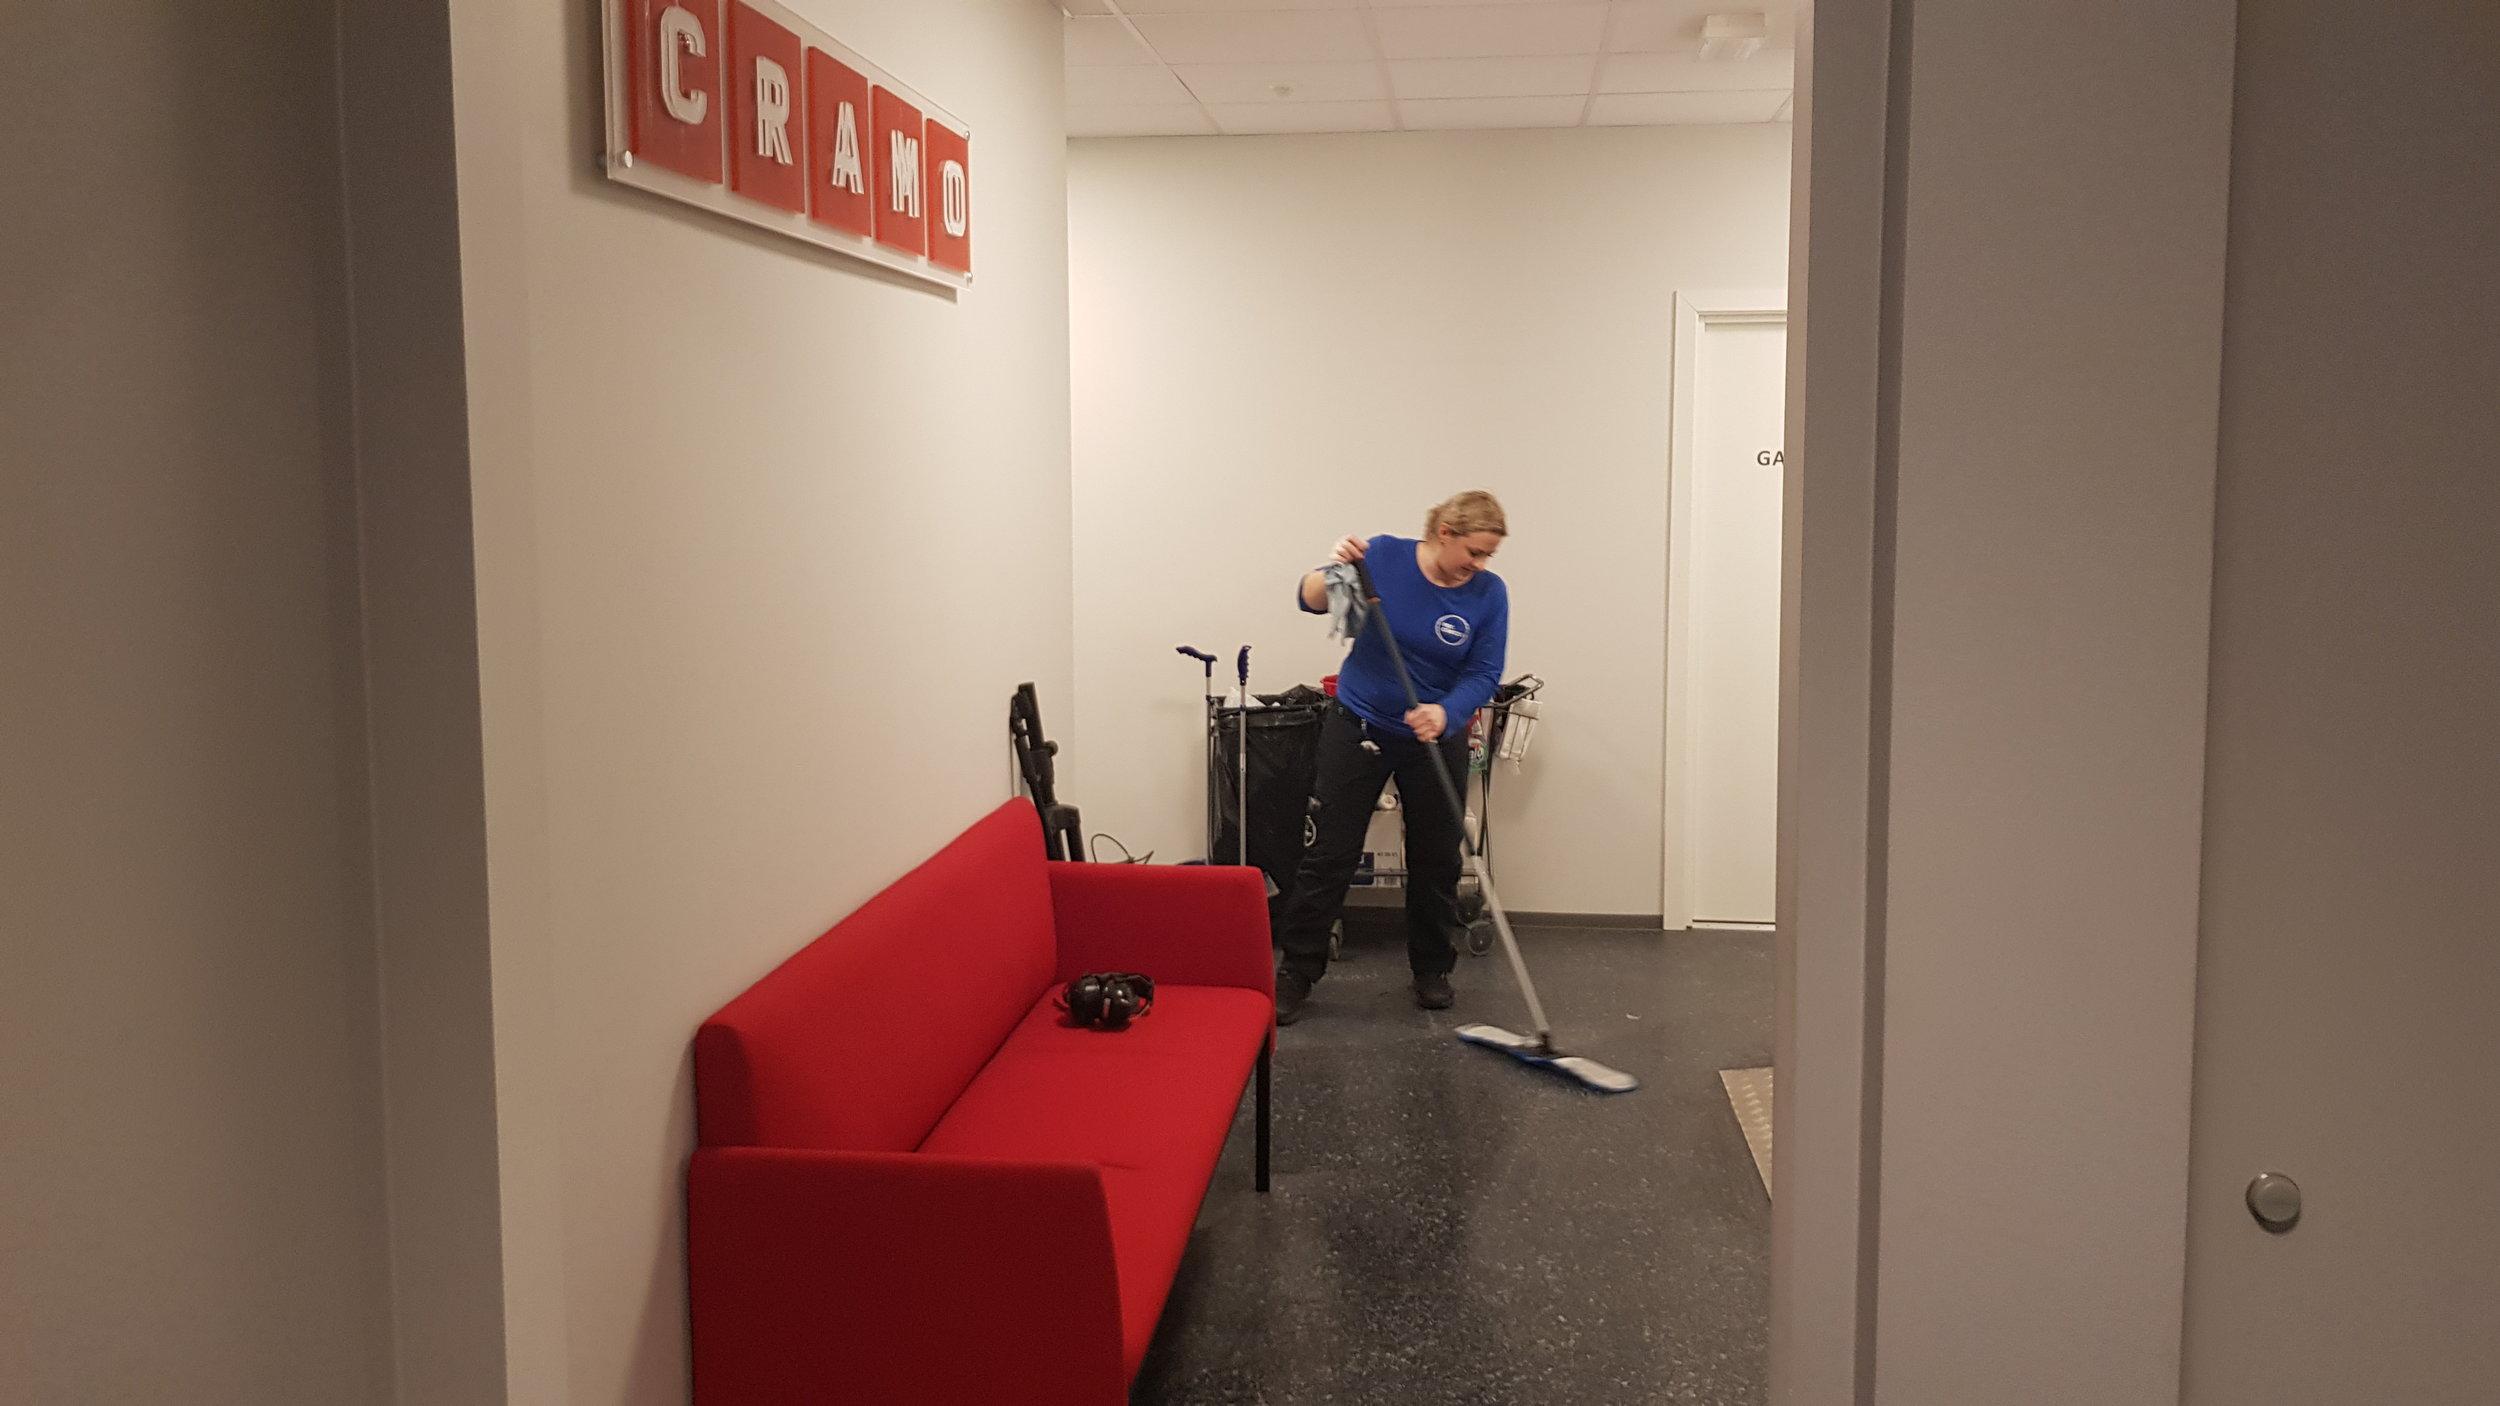 Karolina i full gang med  regelmessig renhold  for Cramo.